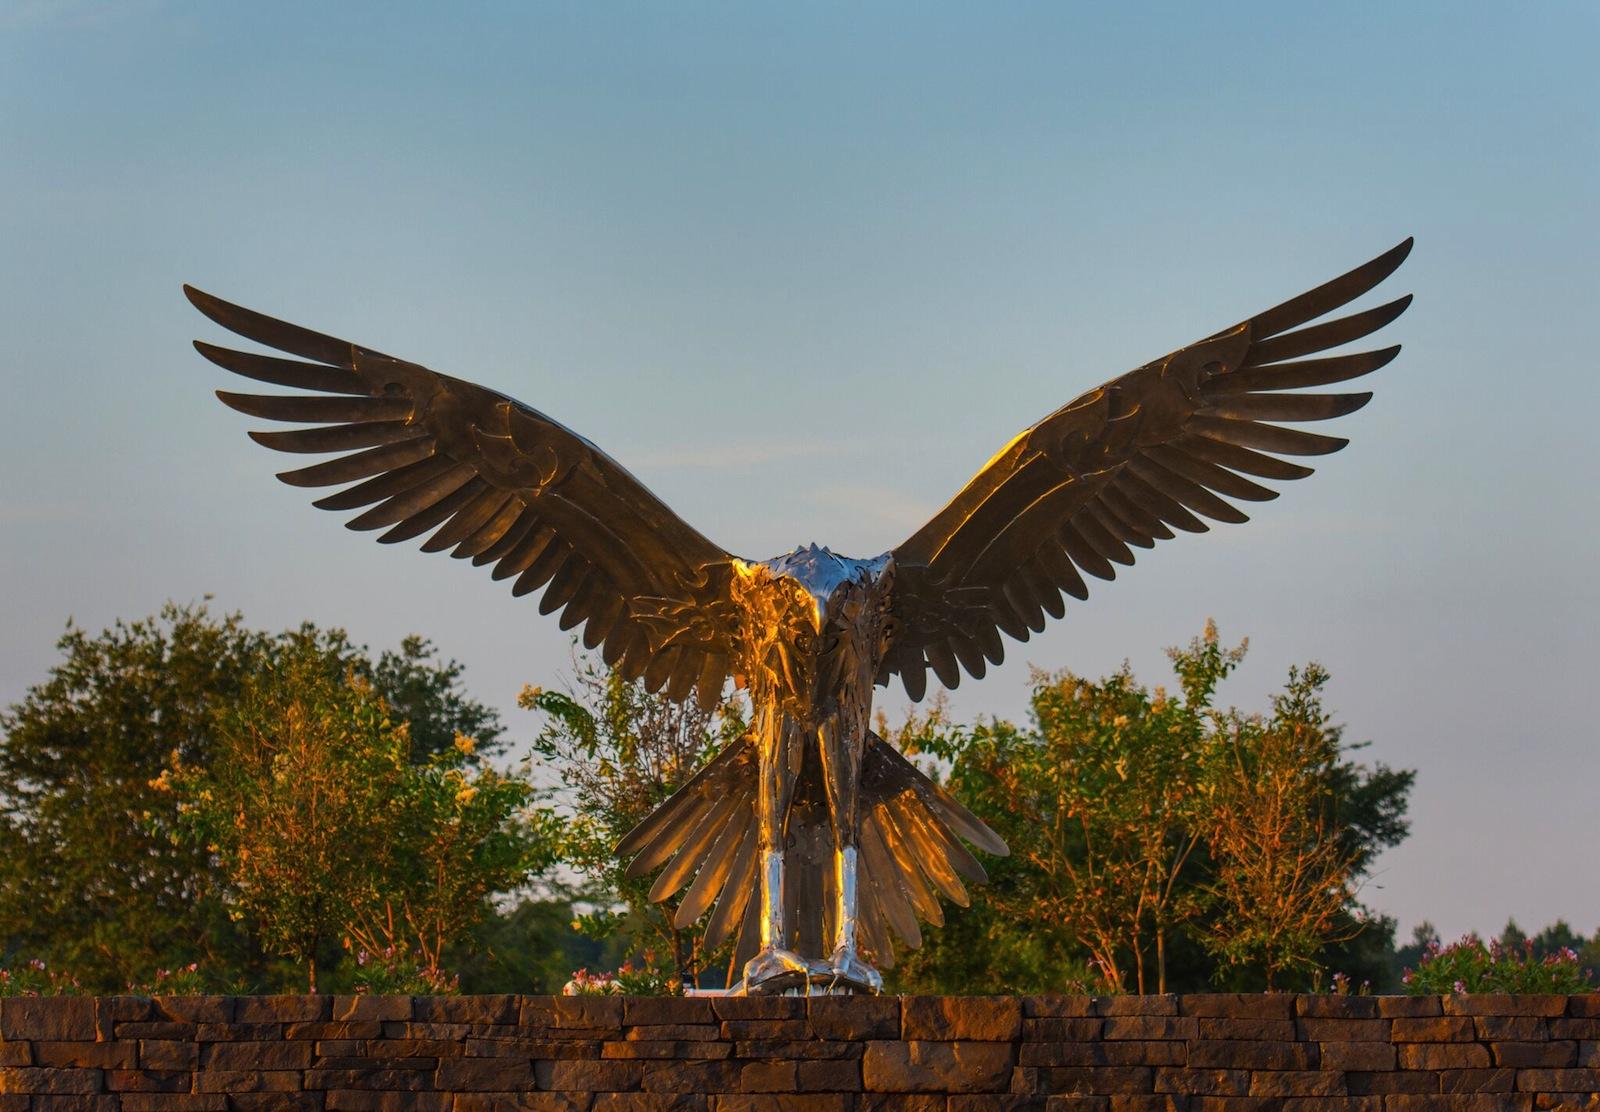 Osprey Sculpture Site Specific